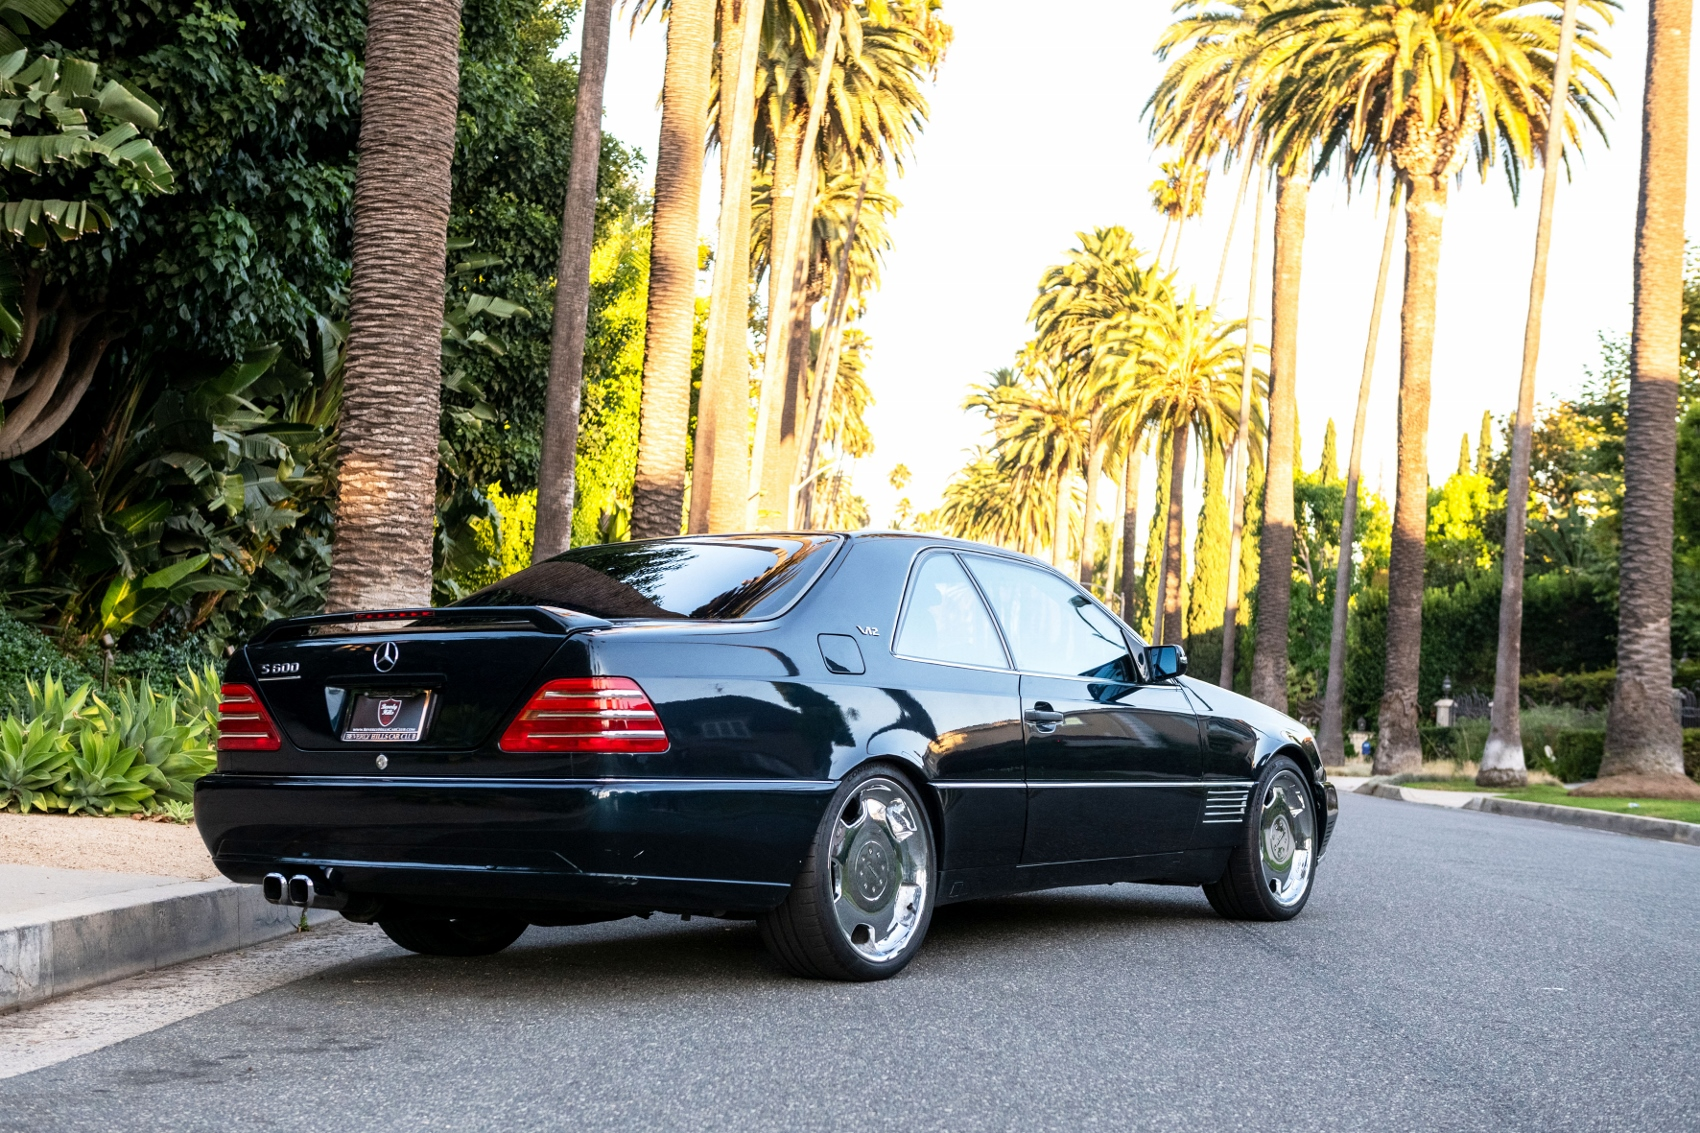 Pozrite si Mercedes S600 Michaela Jordana z roku 1996 Y9JX3Fm8pG lorinsercl600ex-jordanreardiagonall